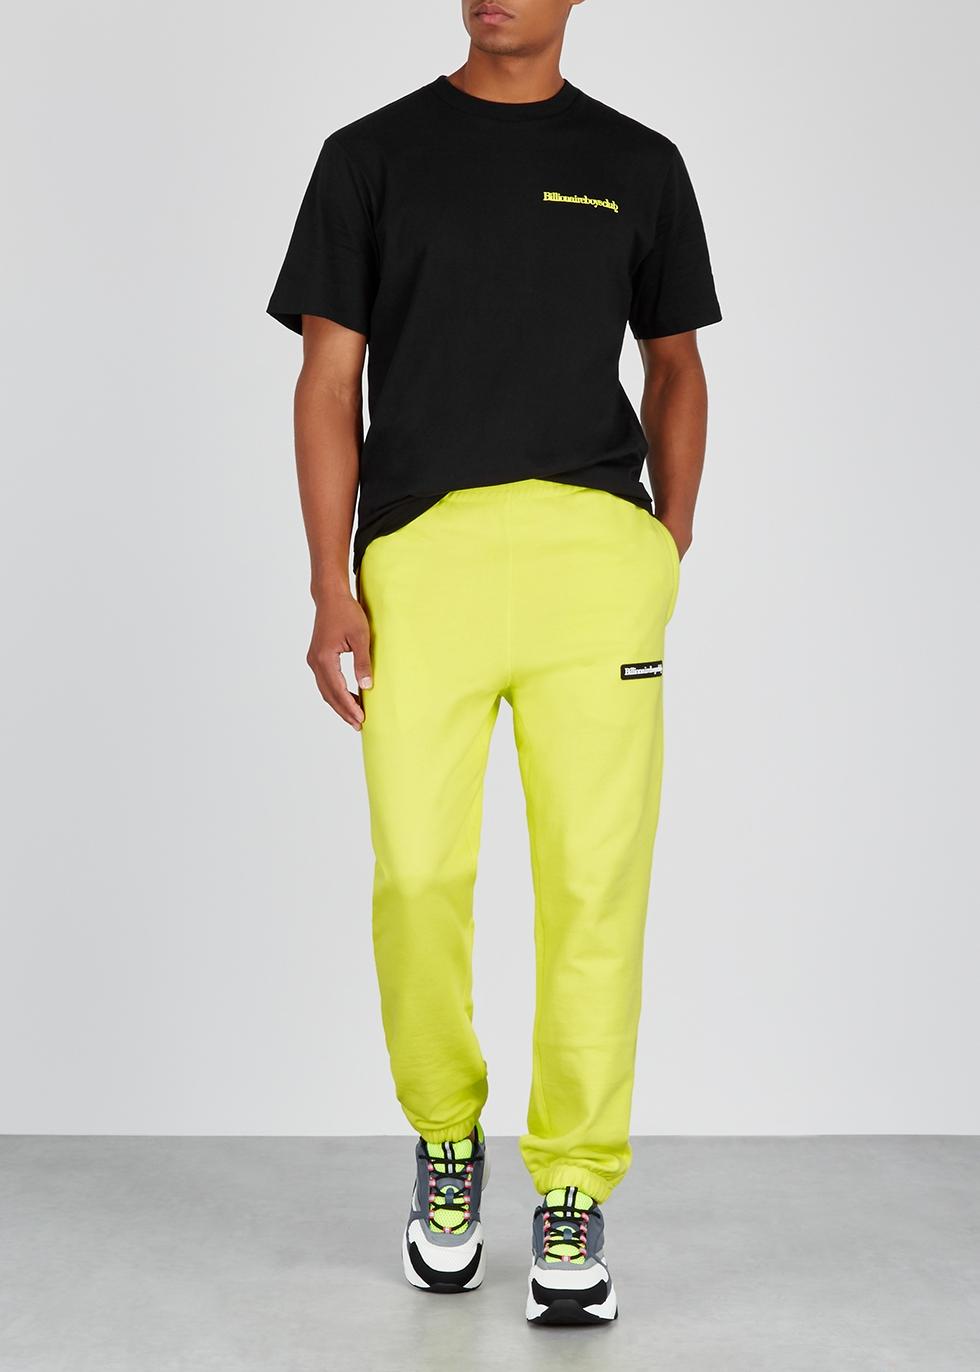 Black cotton T-shirt - Billionaire Boys Club